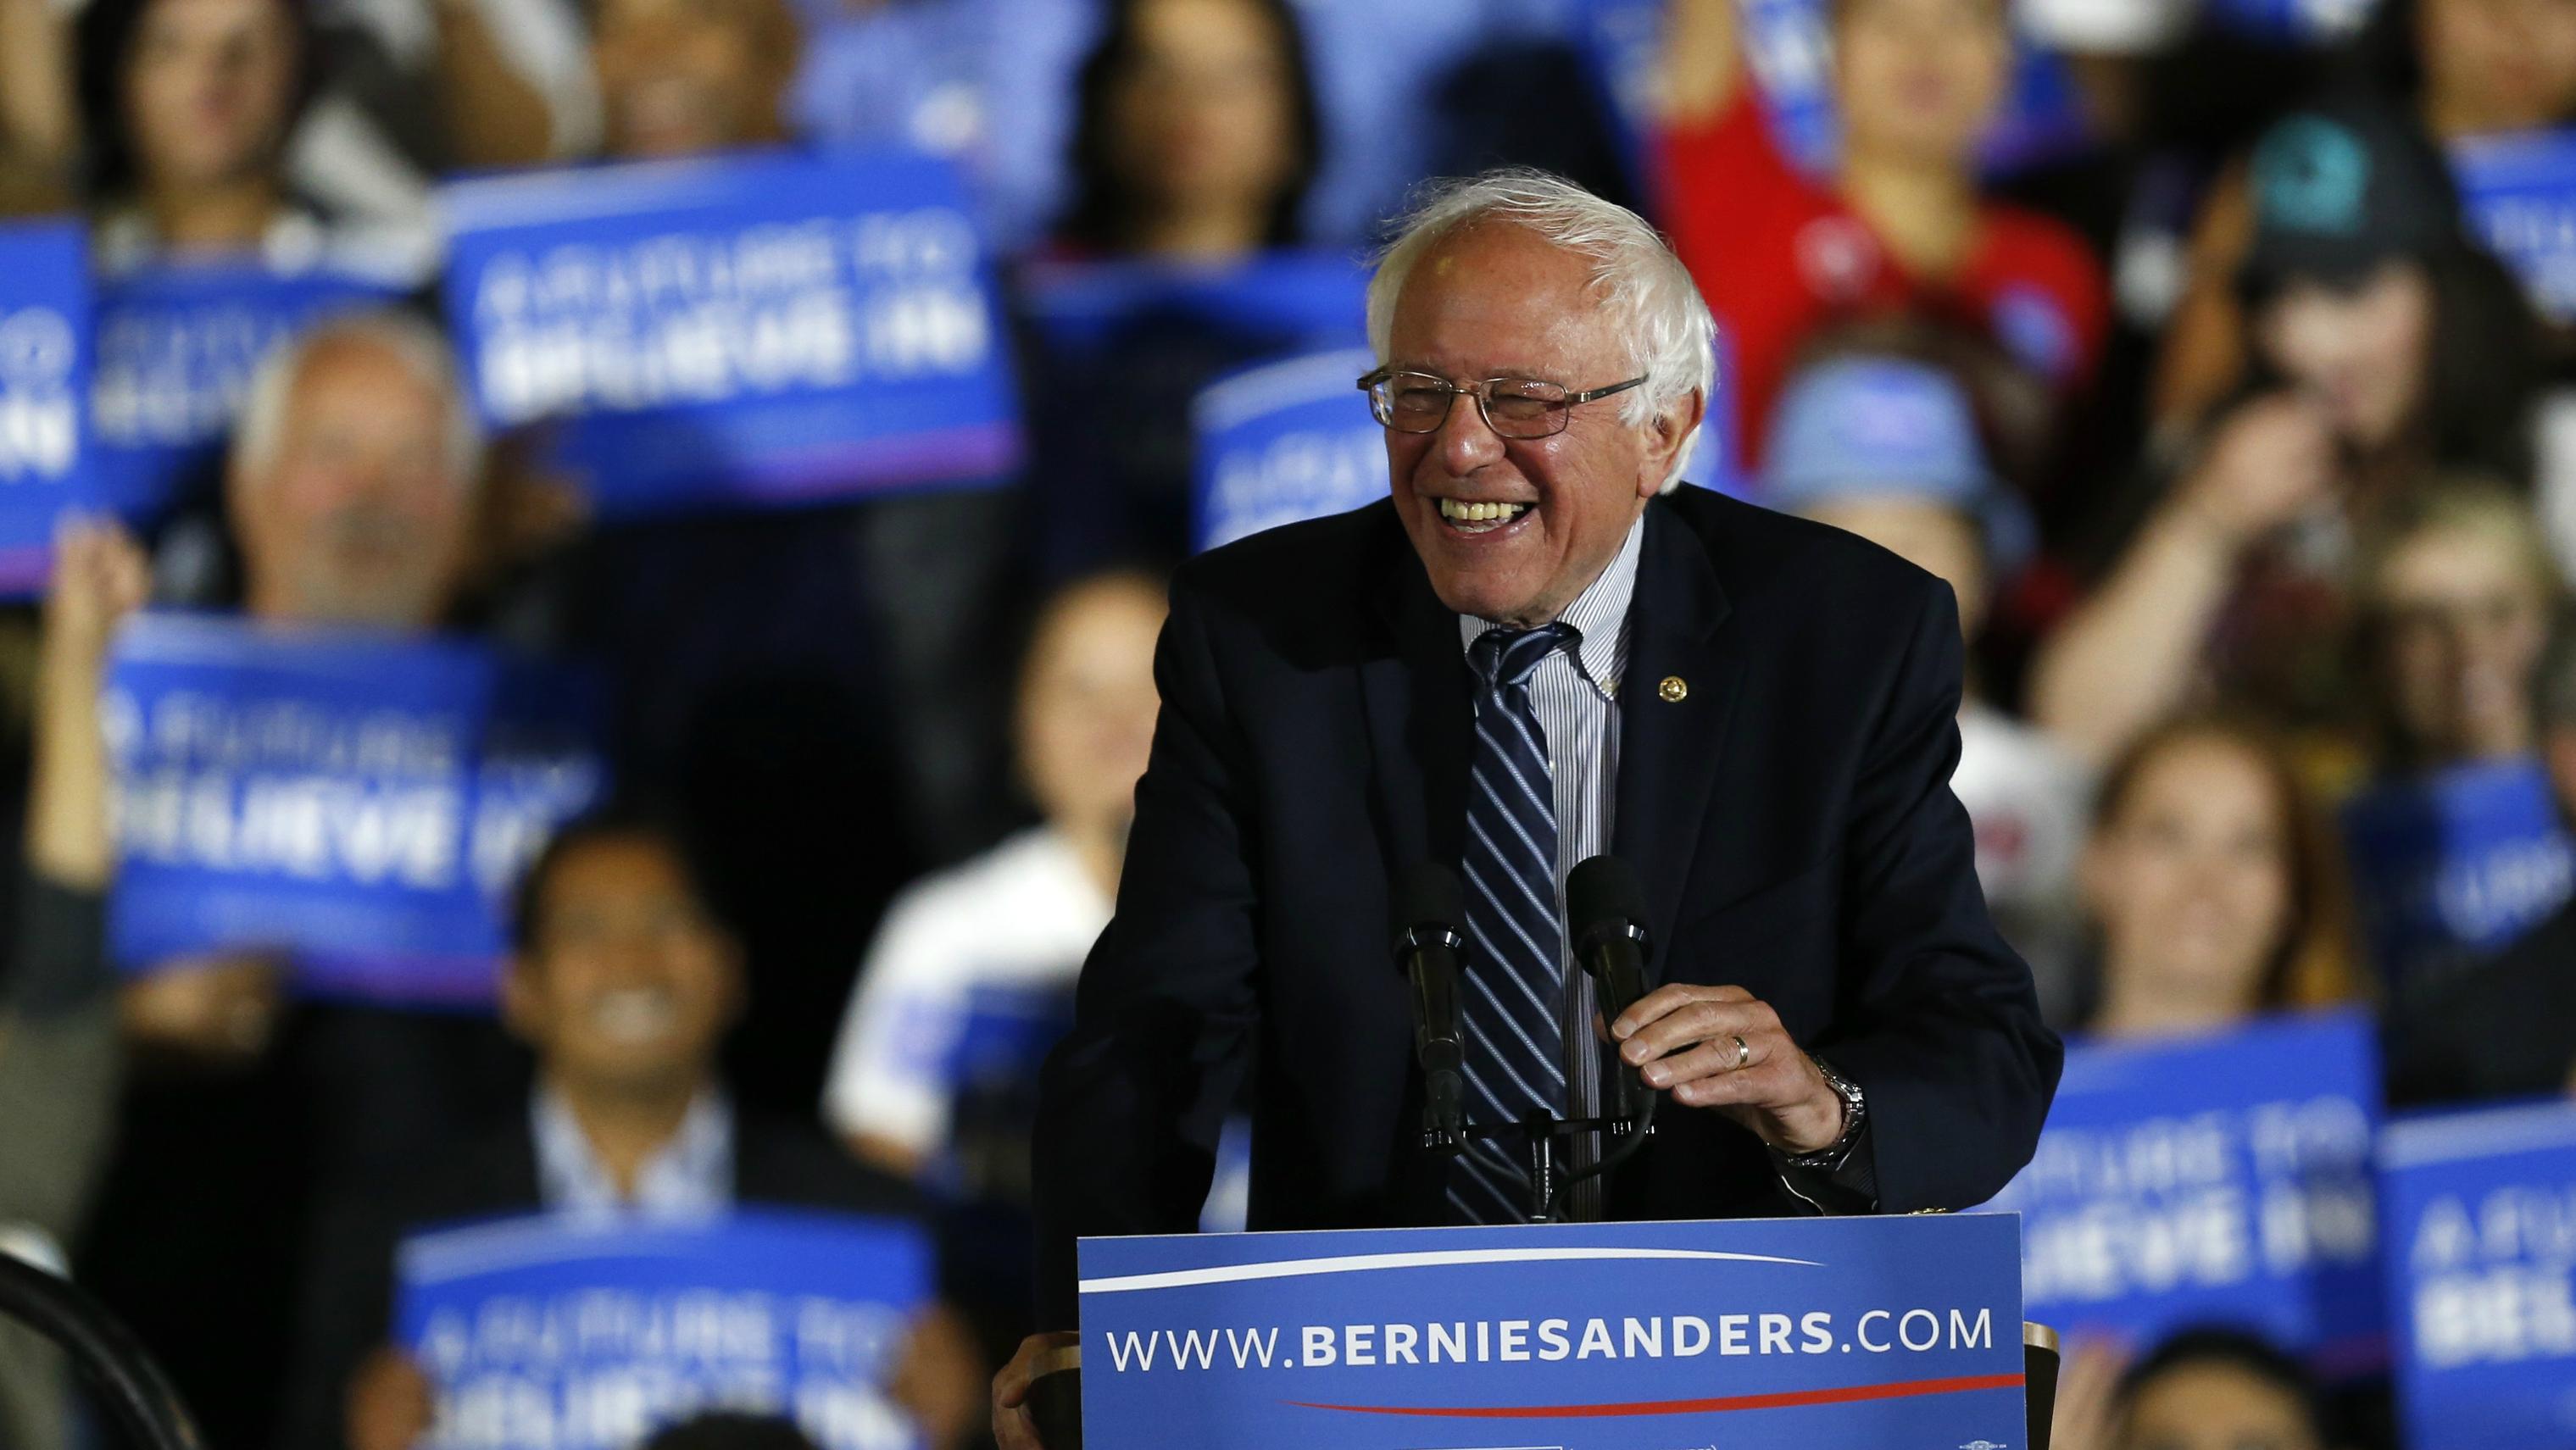 Bernie Sanders Reuters Mario Anzuoni